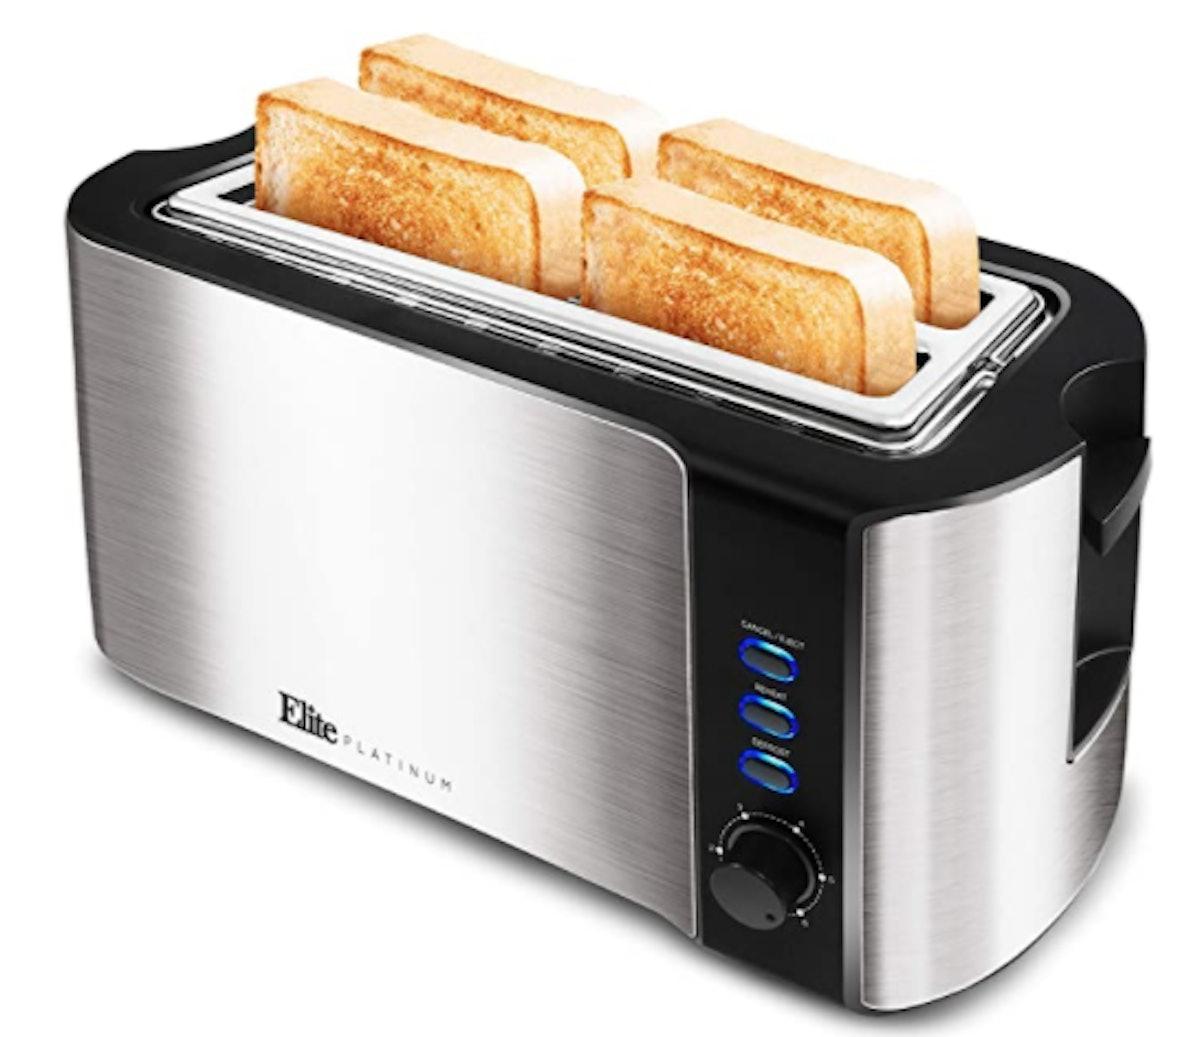 Maxi-Matic Elite Platinum Long Slot Toaster